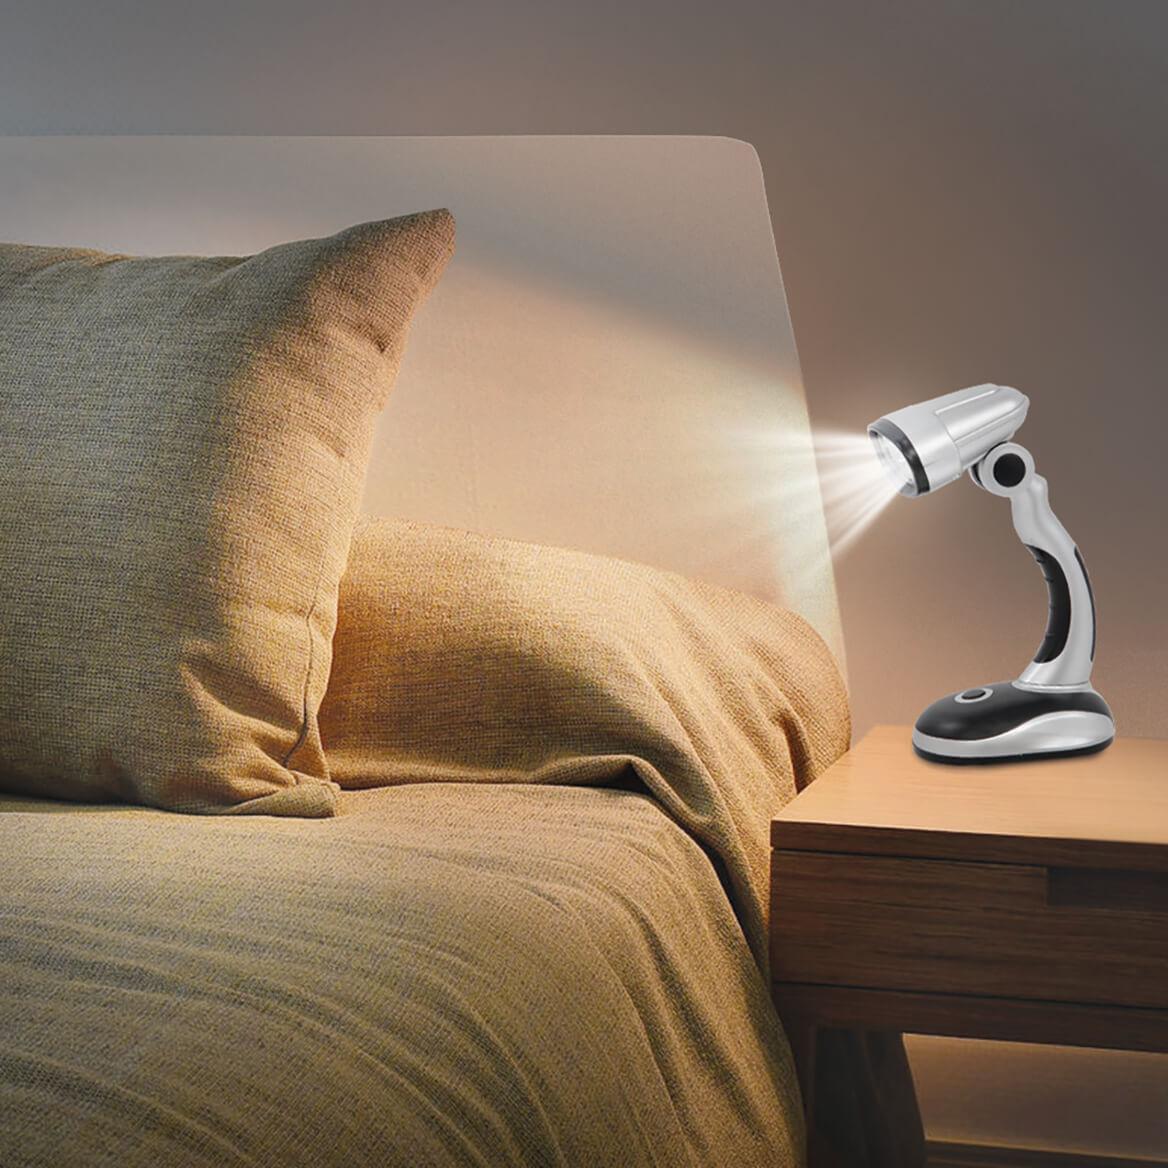 Anywhere Utility Light-339410